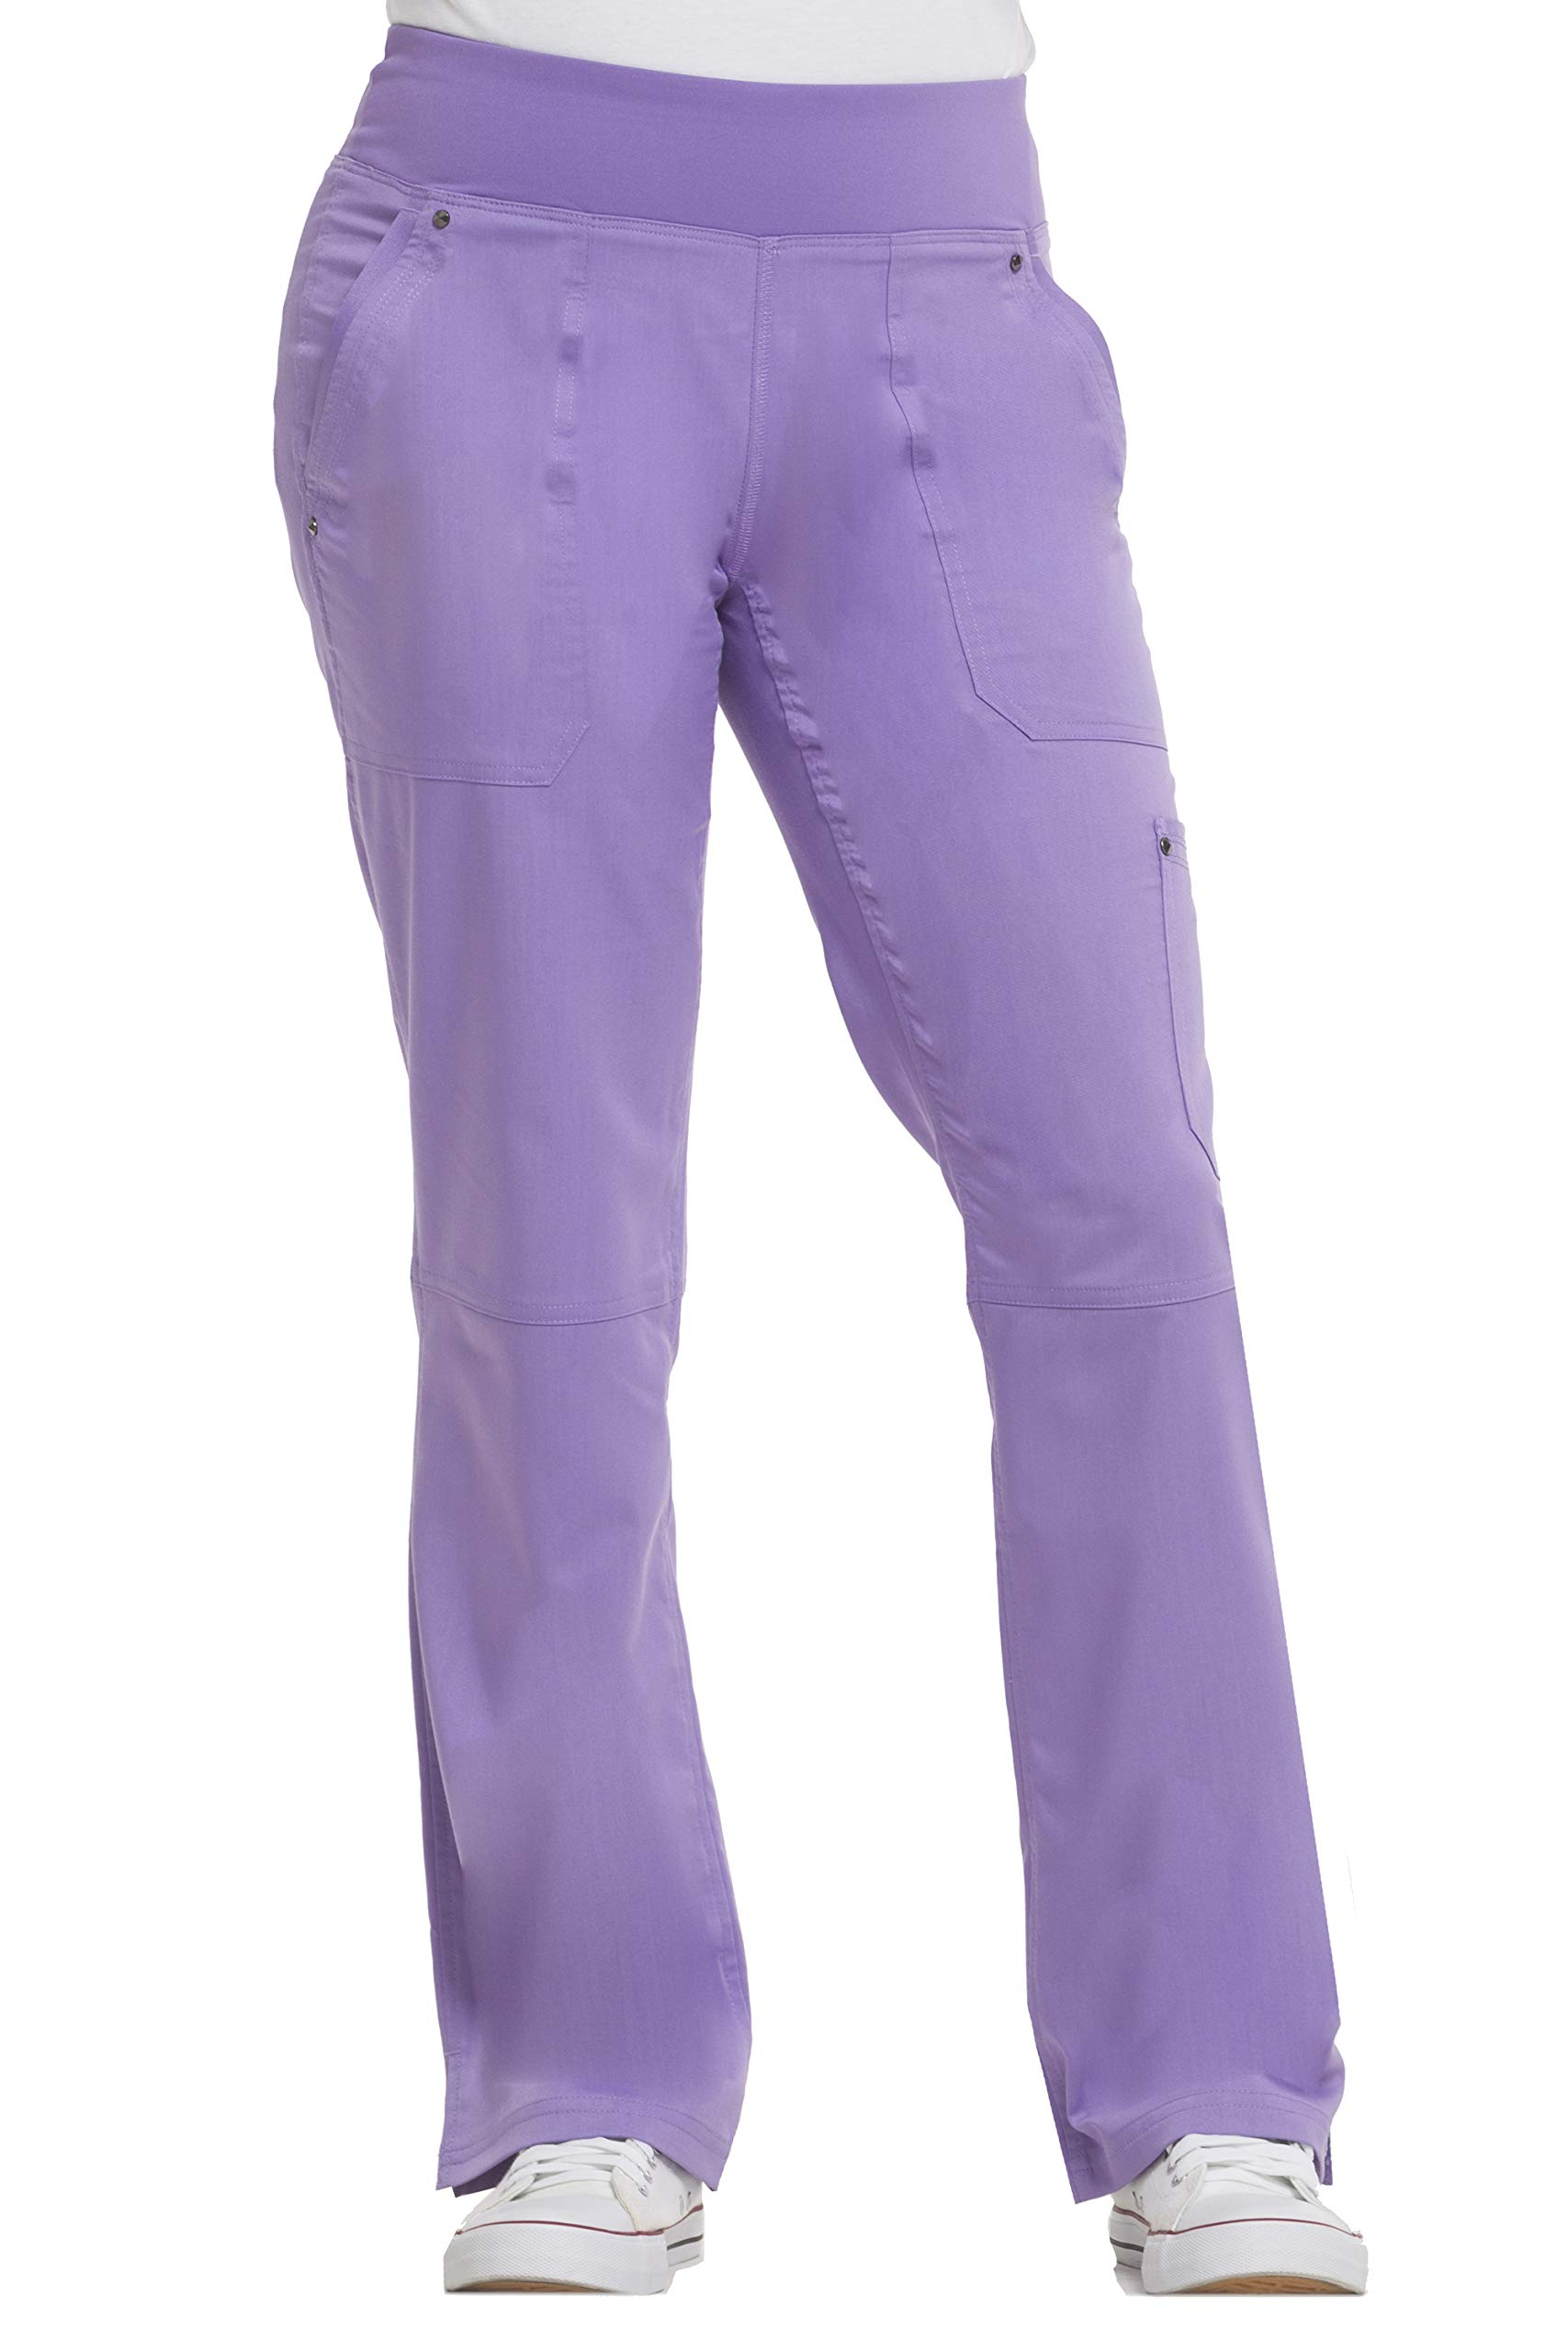 healing hands Purple Label Yoga Women's Tori 9133 5 Pocket Knit Waist Pant Purple Haze-2X by healing hands